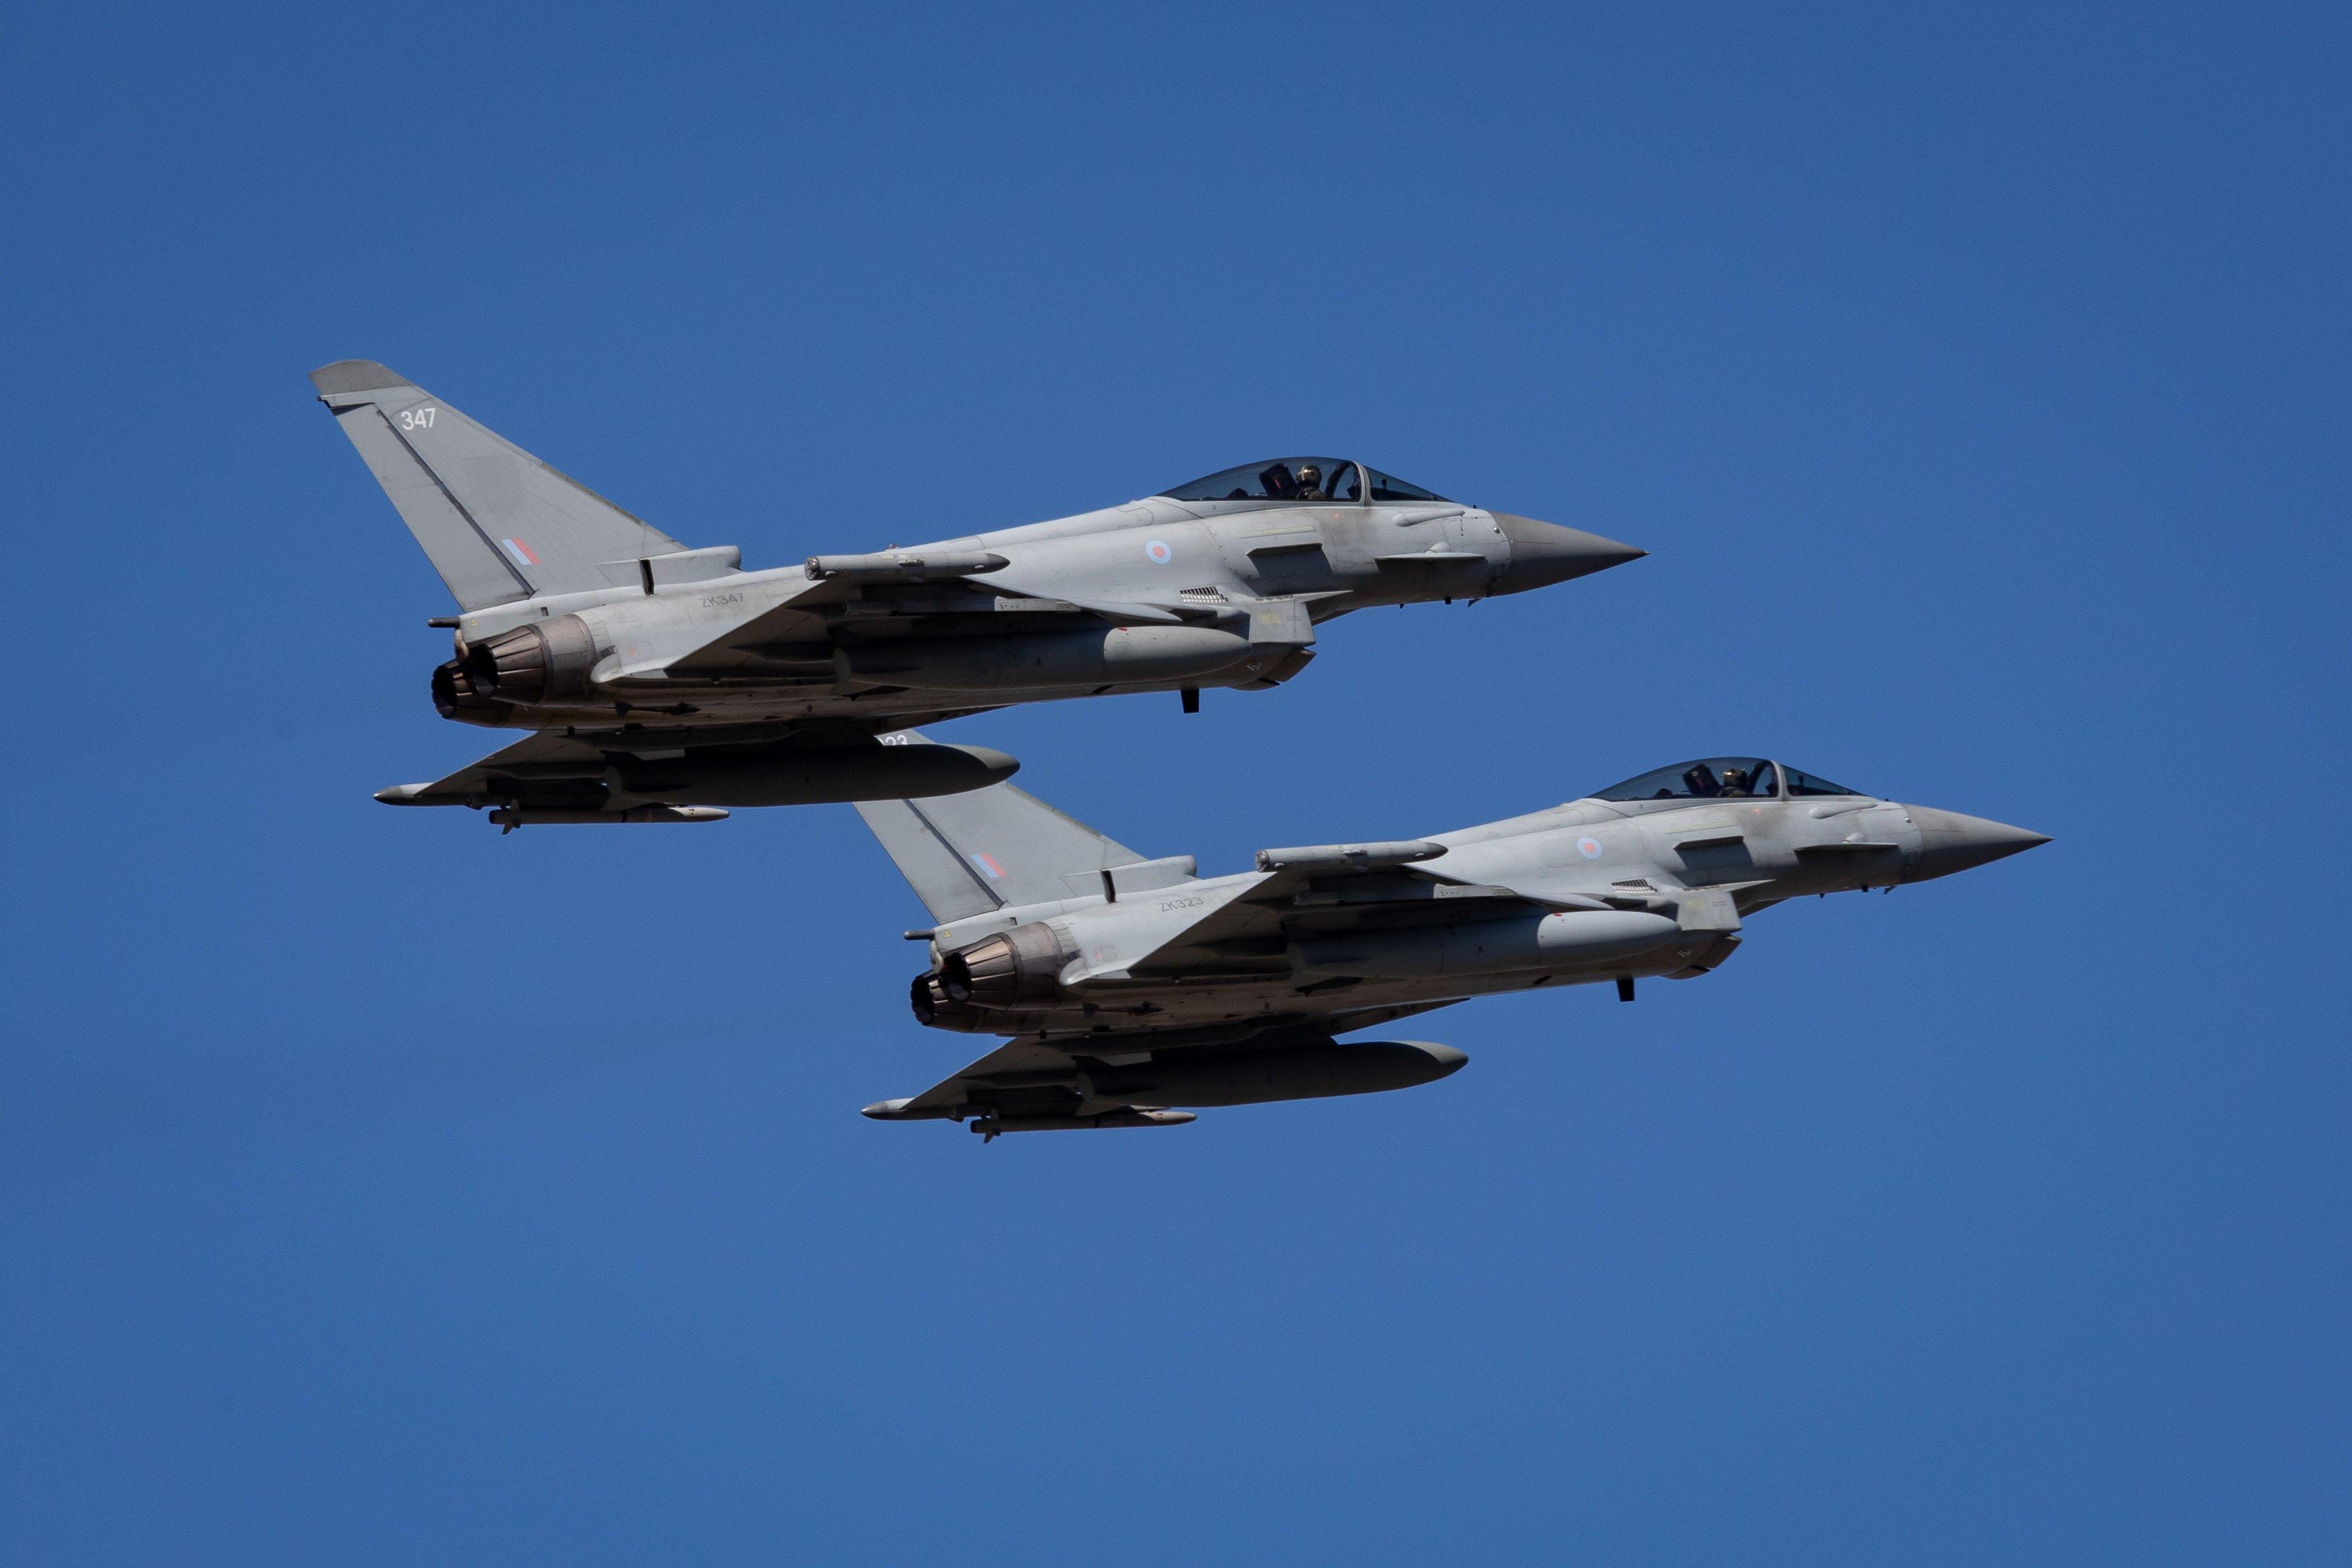 Typhoon FGR4s [MoD Crown Copyright/Sgt Ashley Keates]